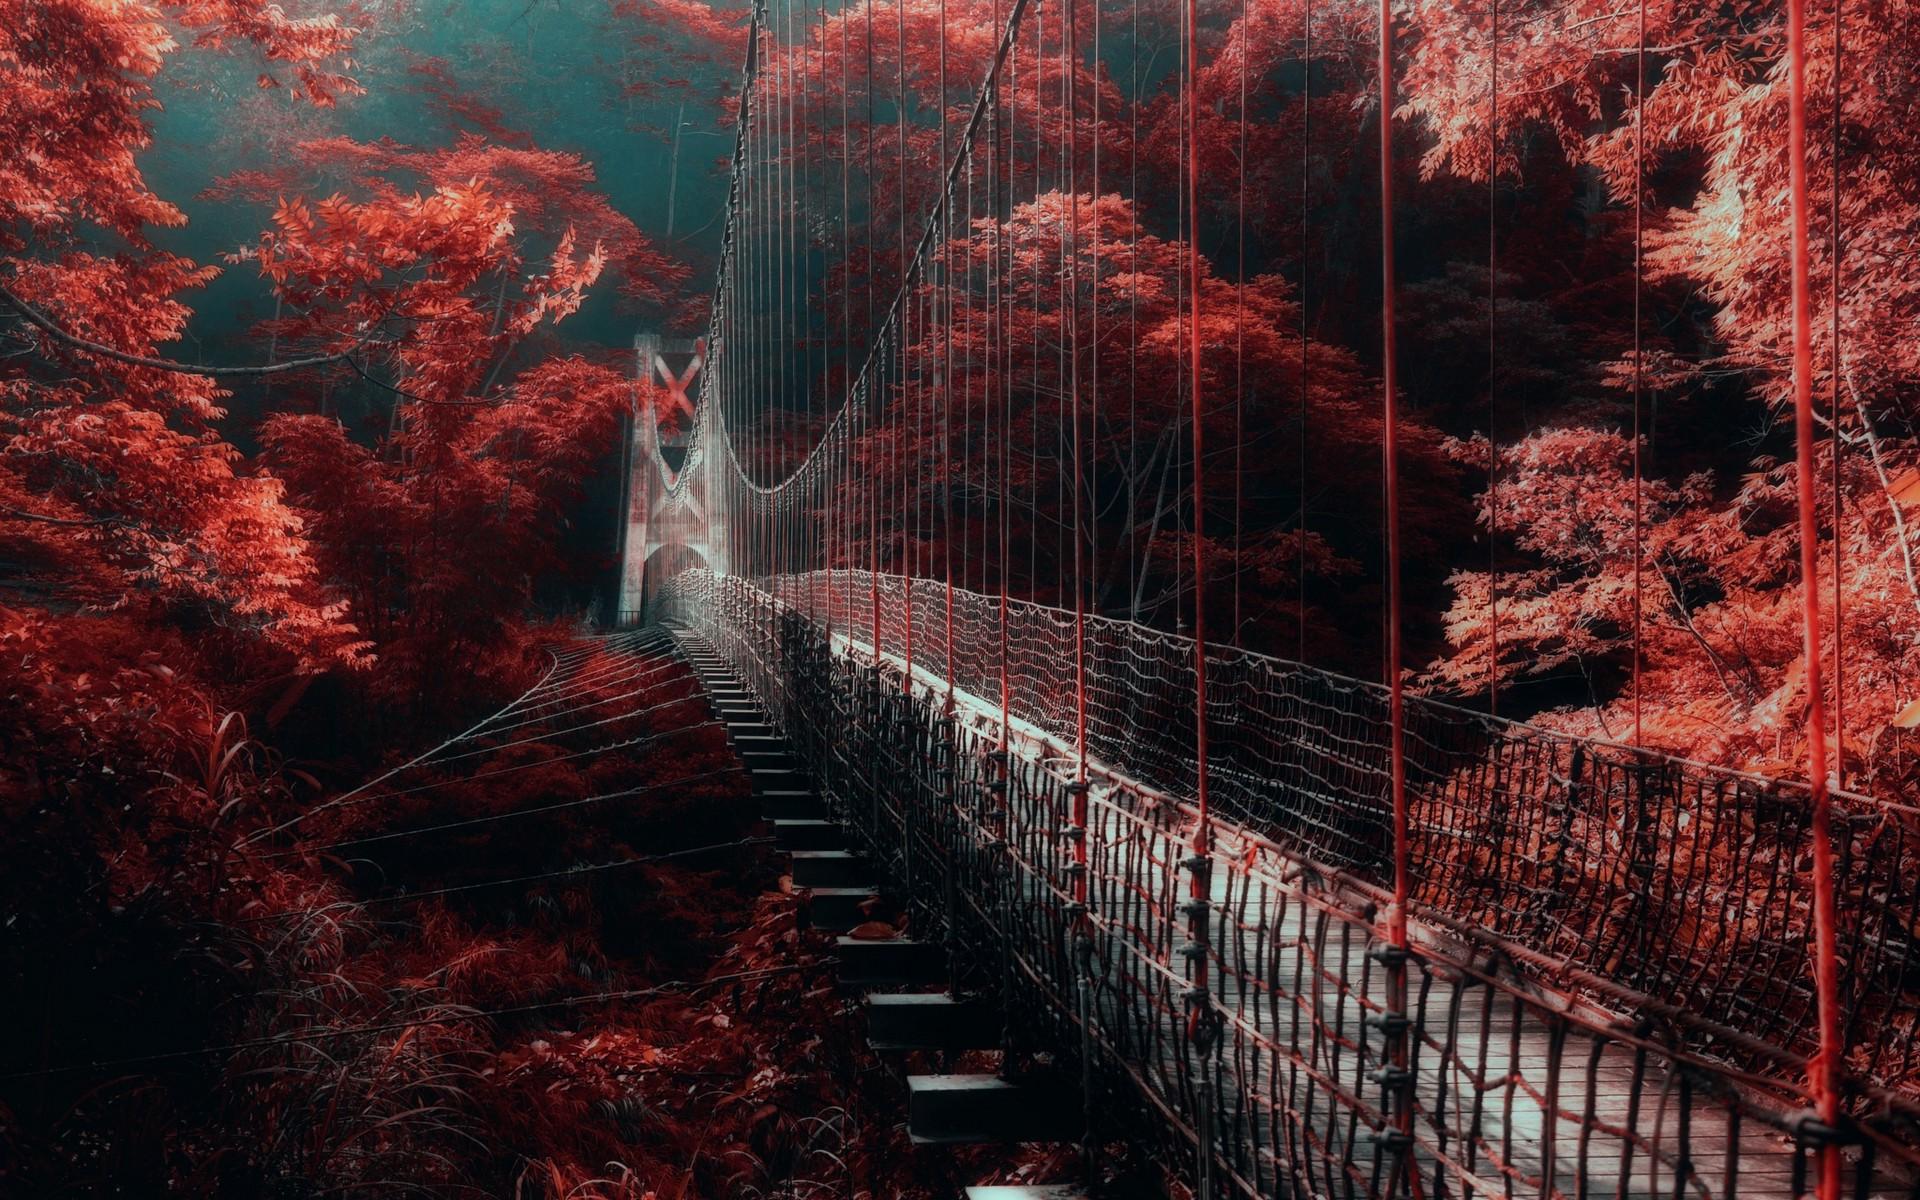 Wallpaper : trees, landscape, forest